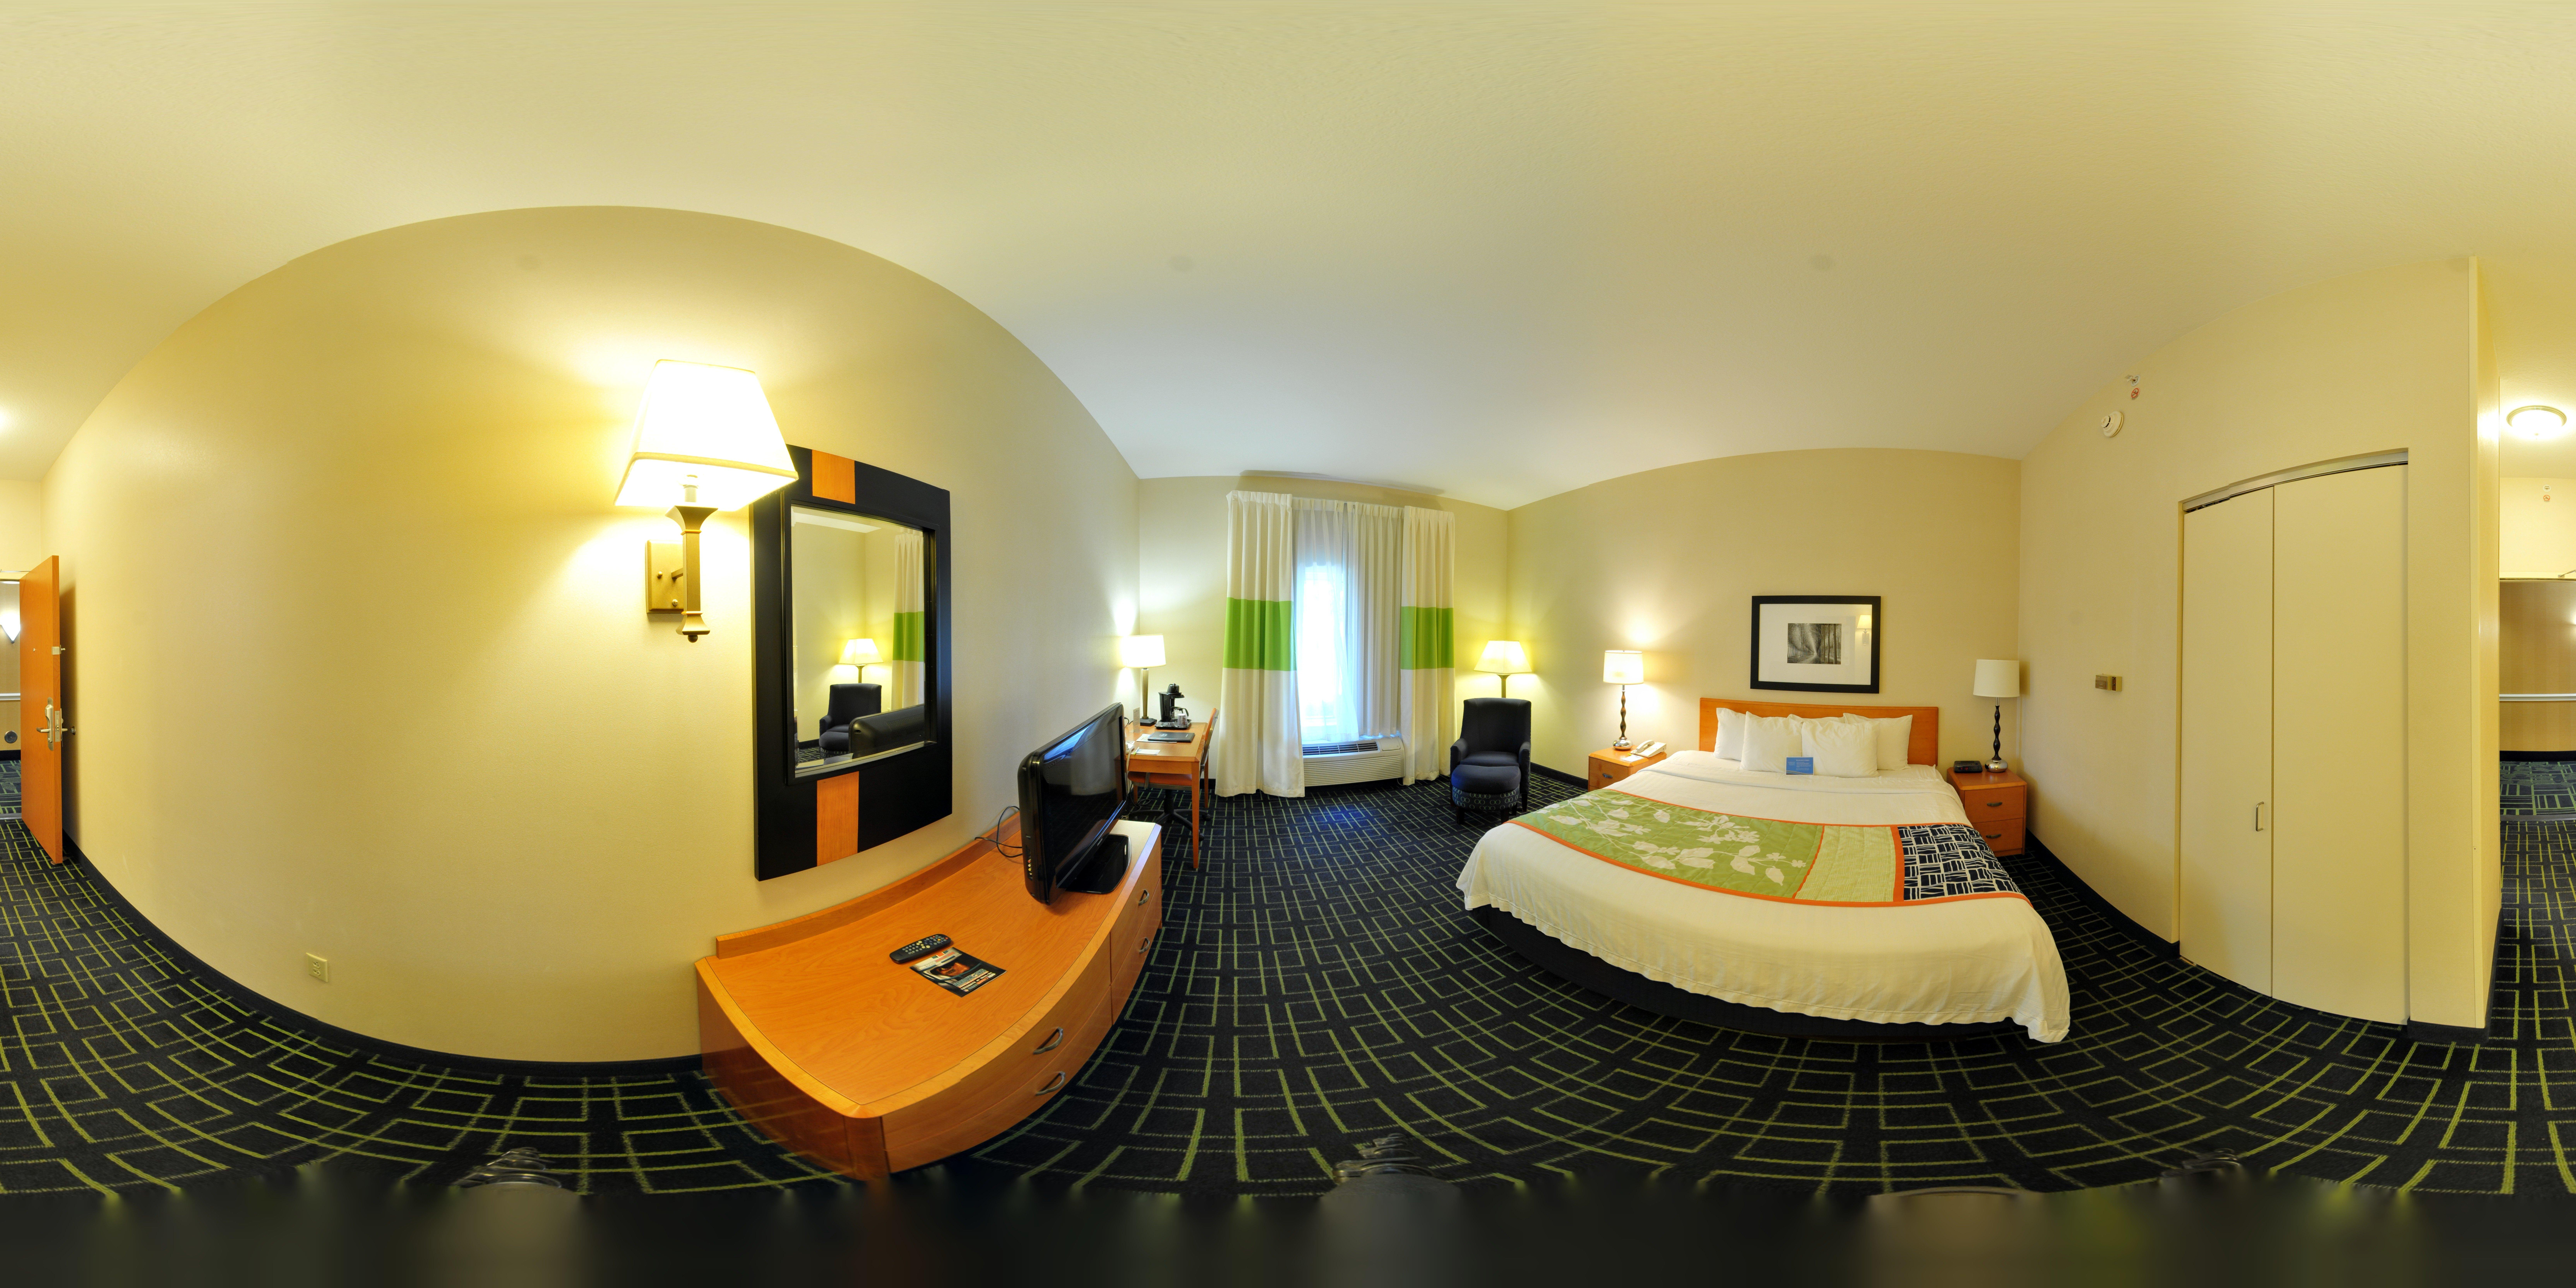 Fairfield Inn & Suites by Marriott Akron South image 23